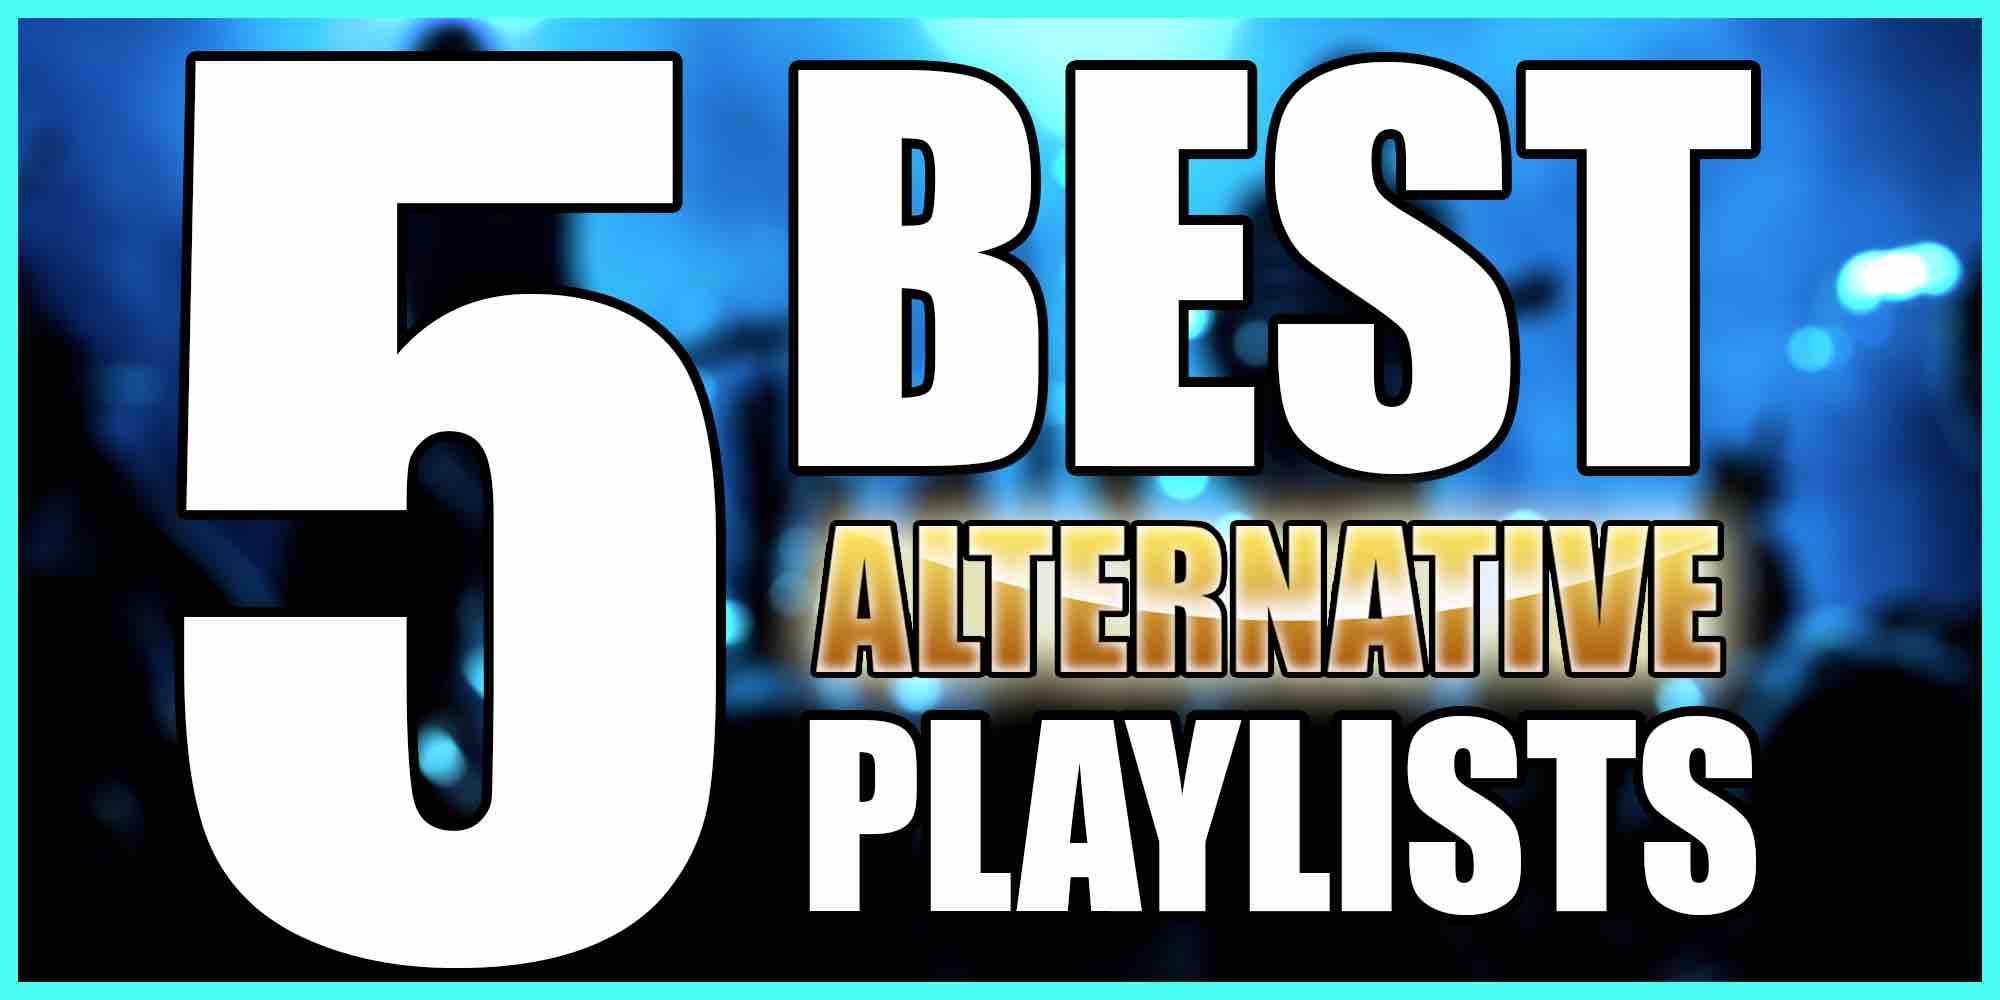 5 best alternative playlists